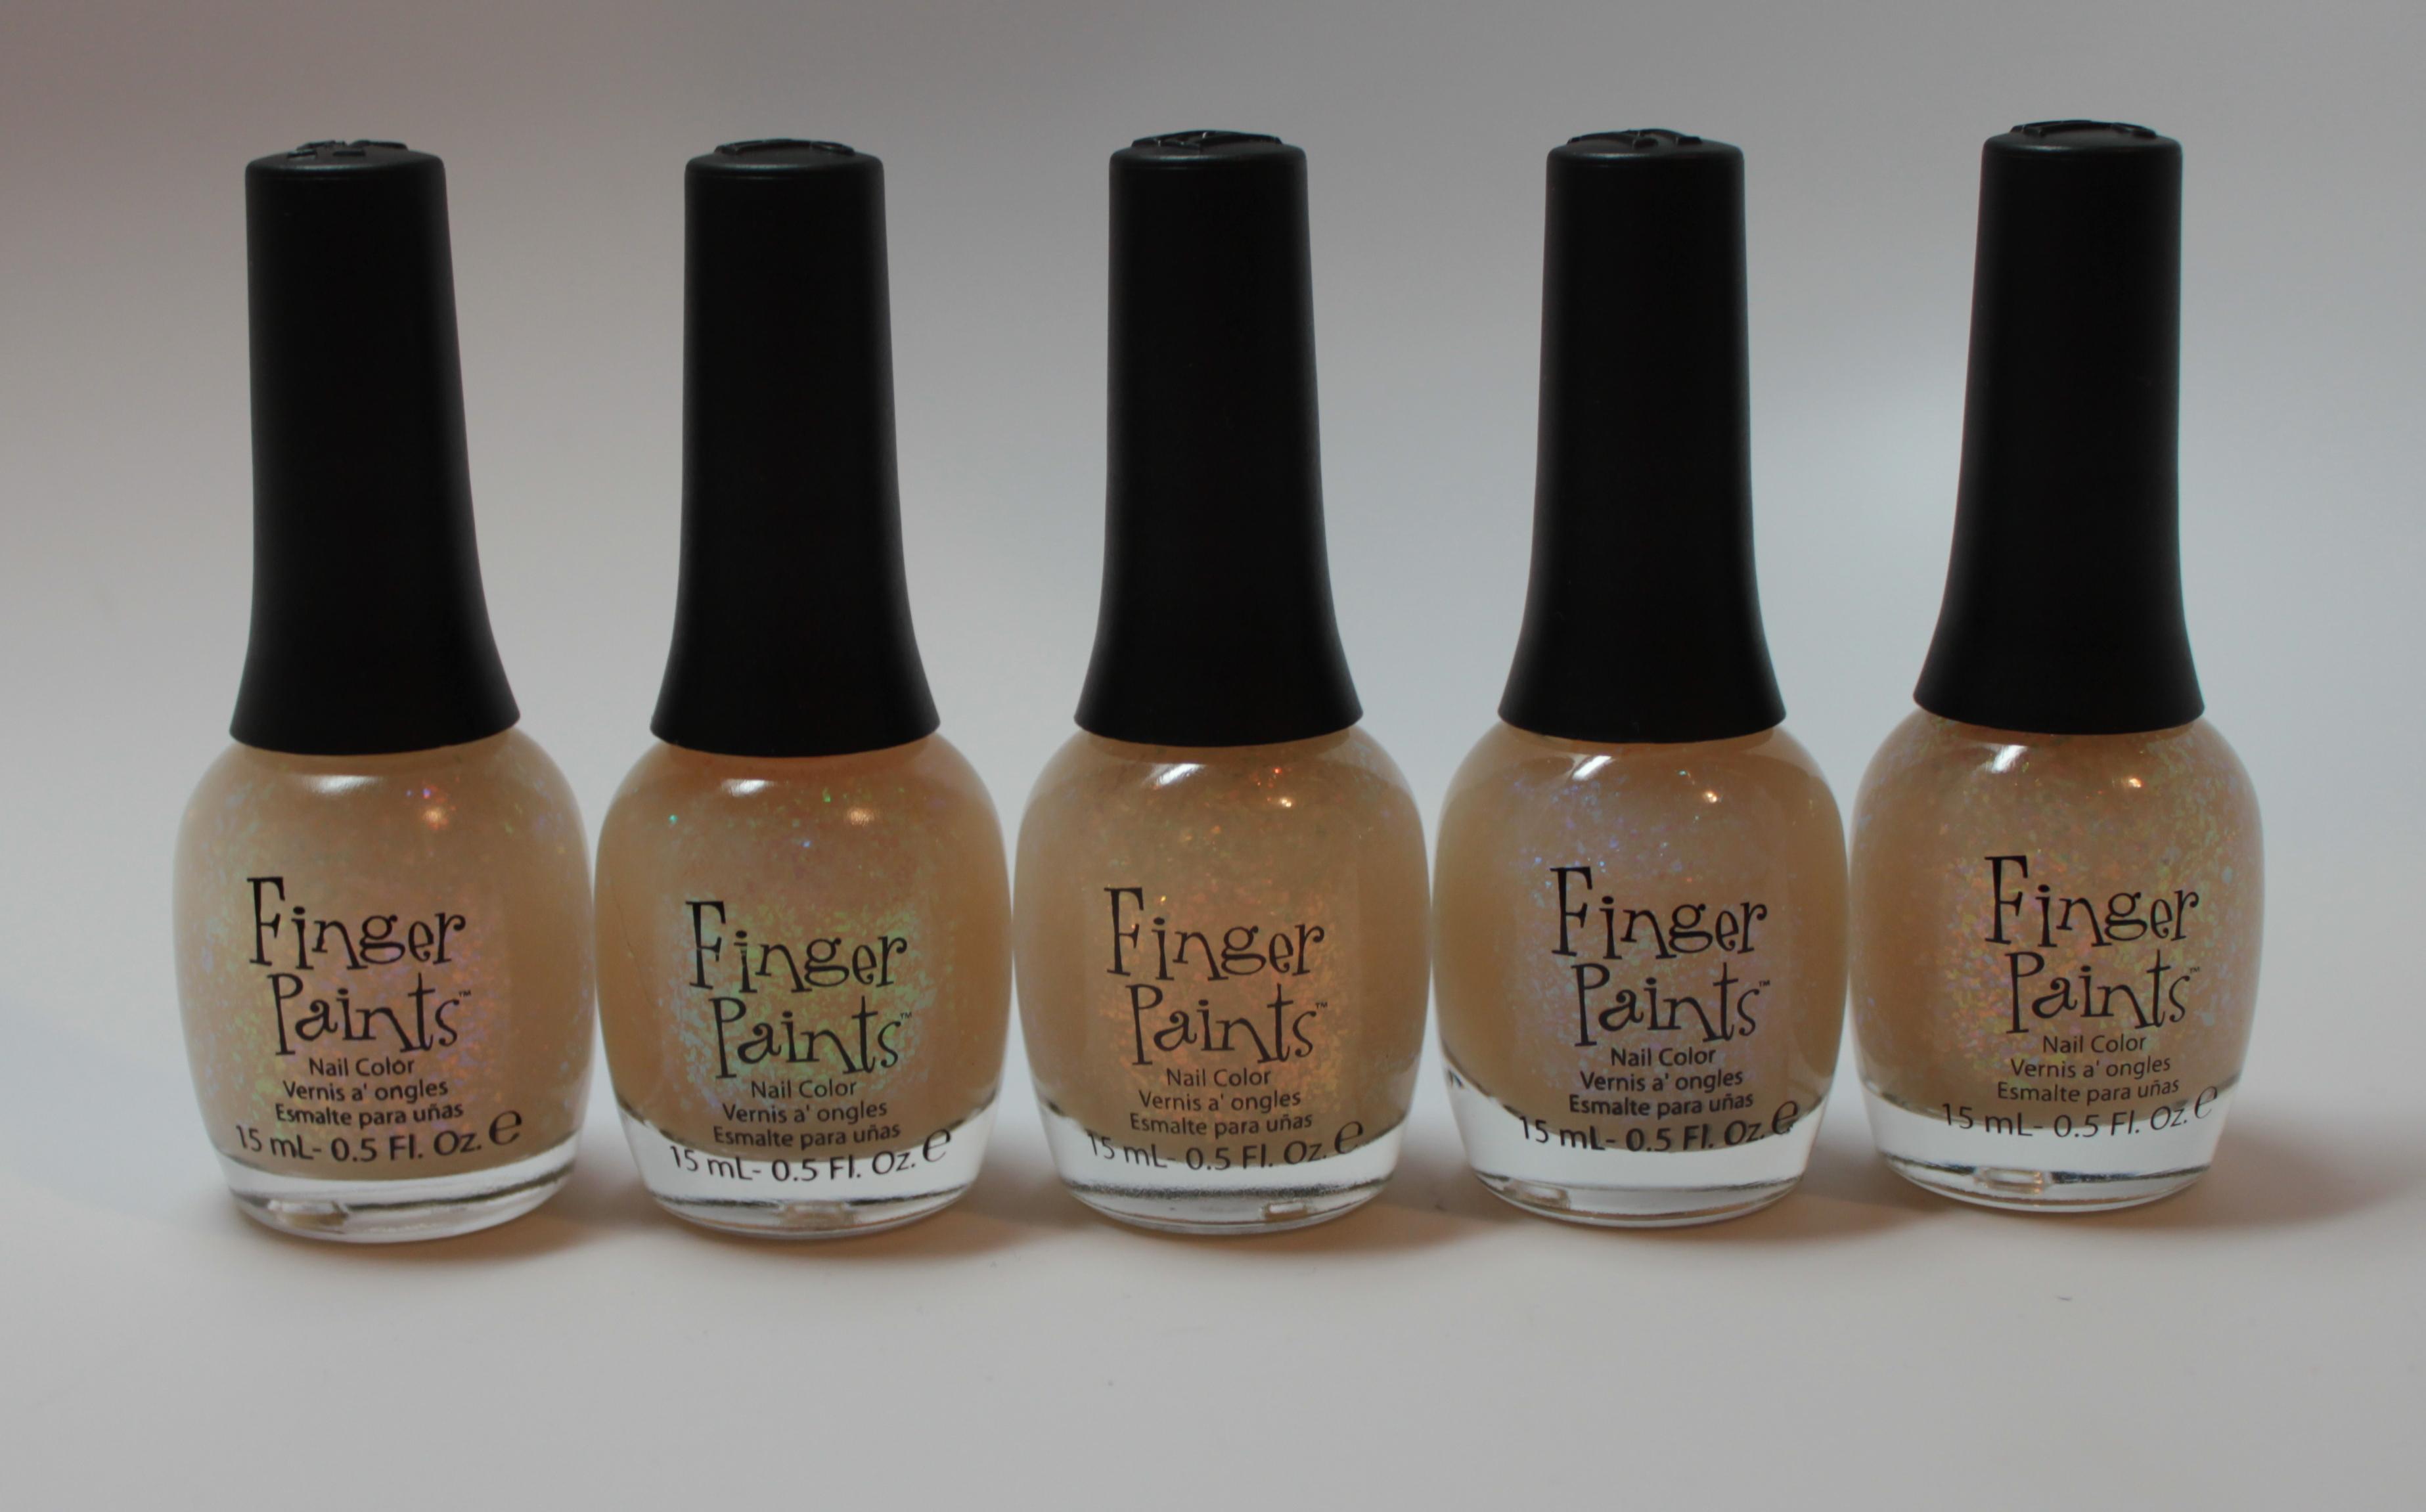 Finger Paints L-R: Asylum, Flecked, Flashy, Motley, Twisted